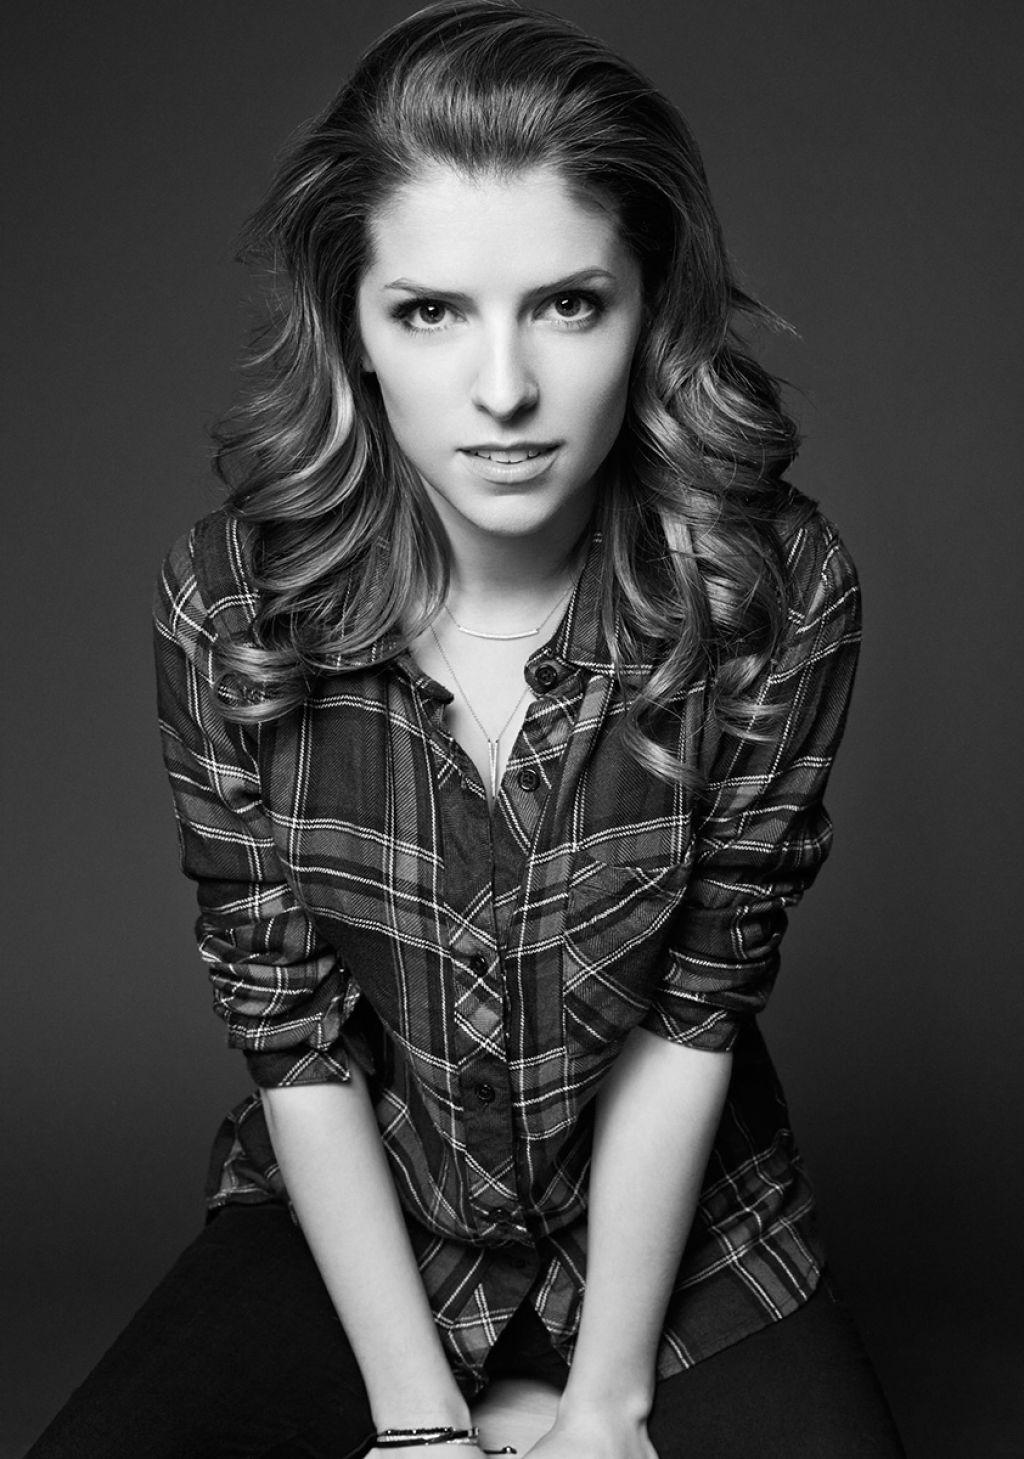 Anna Kendrick Portraits Photoshoot 2014